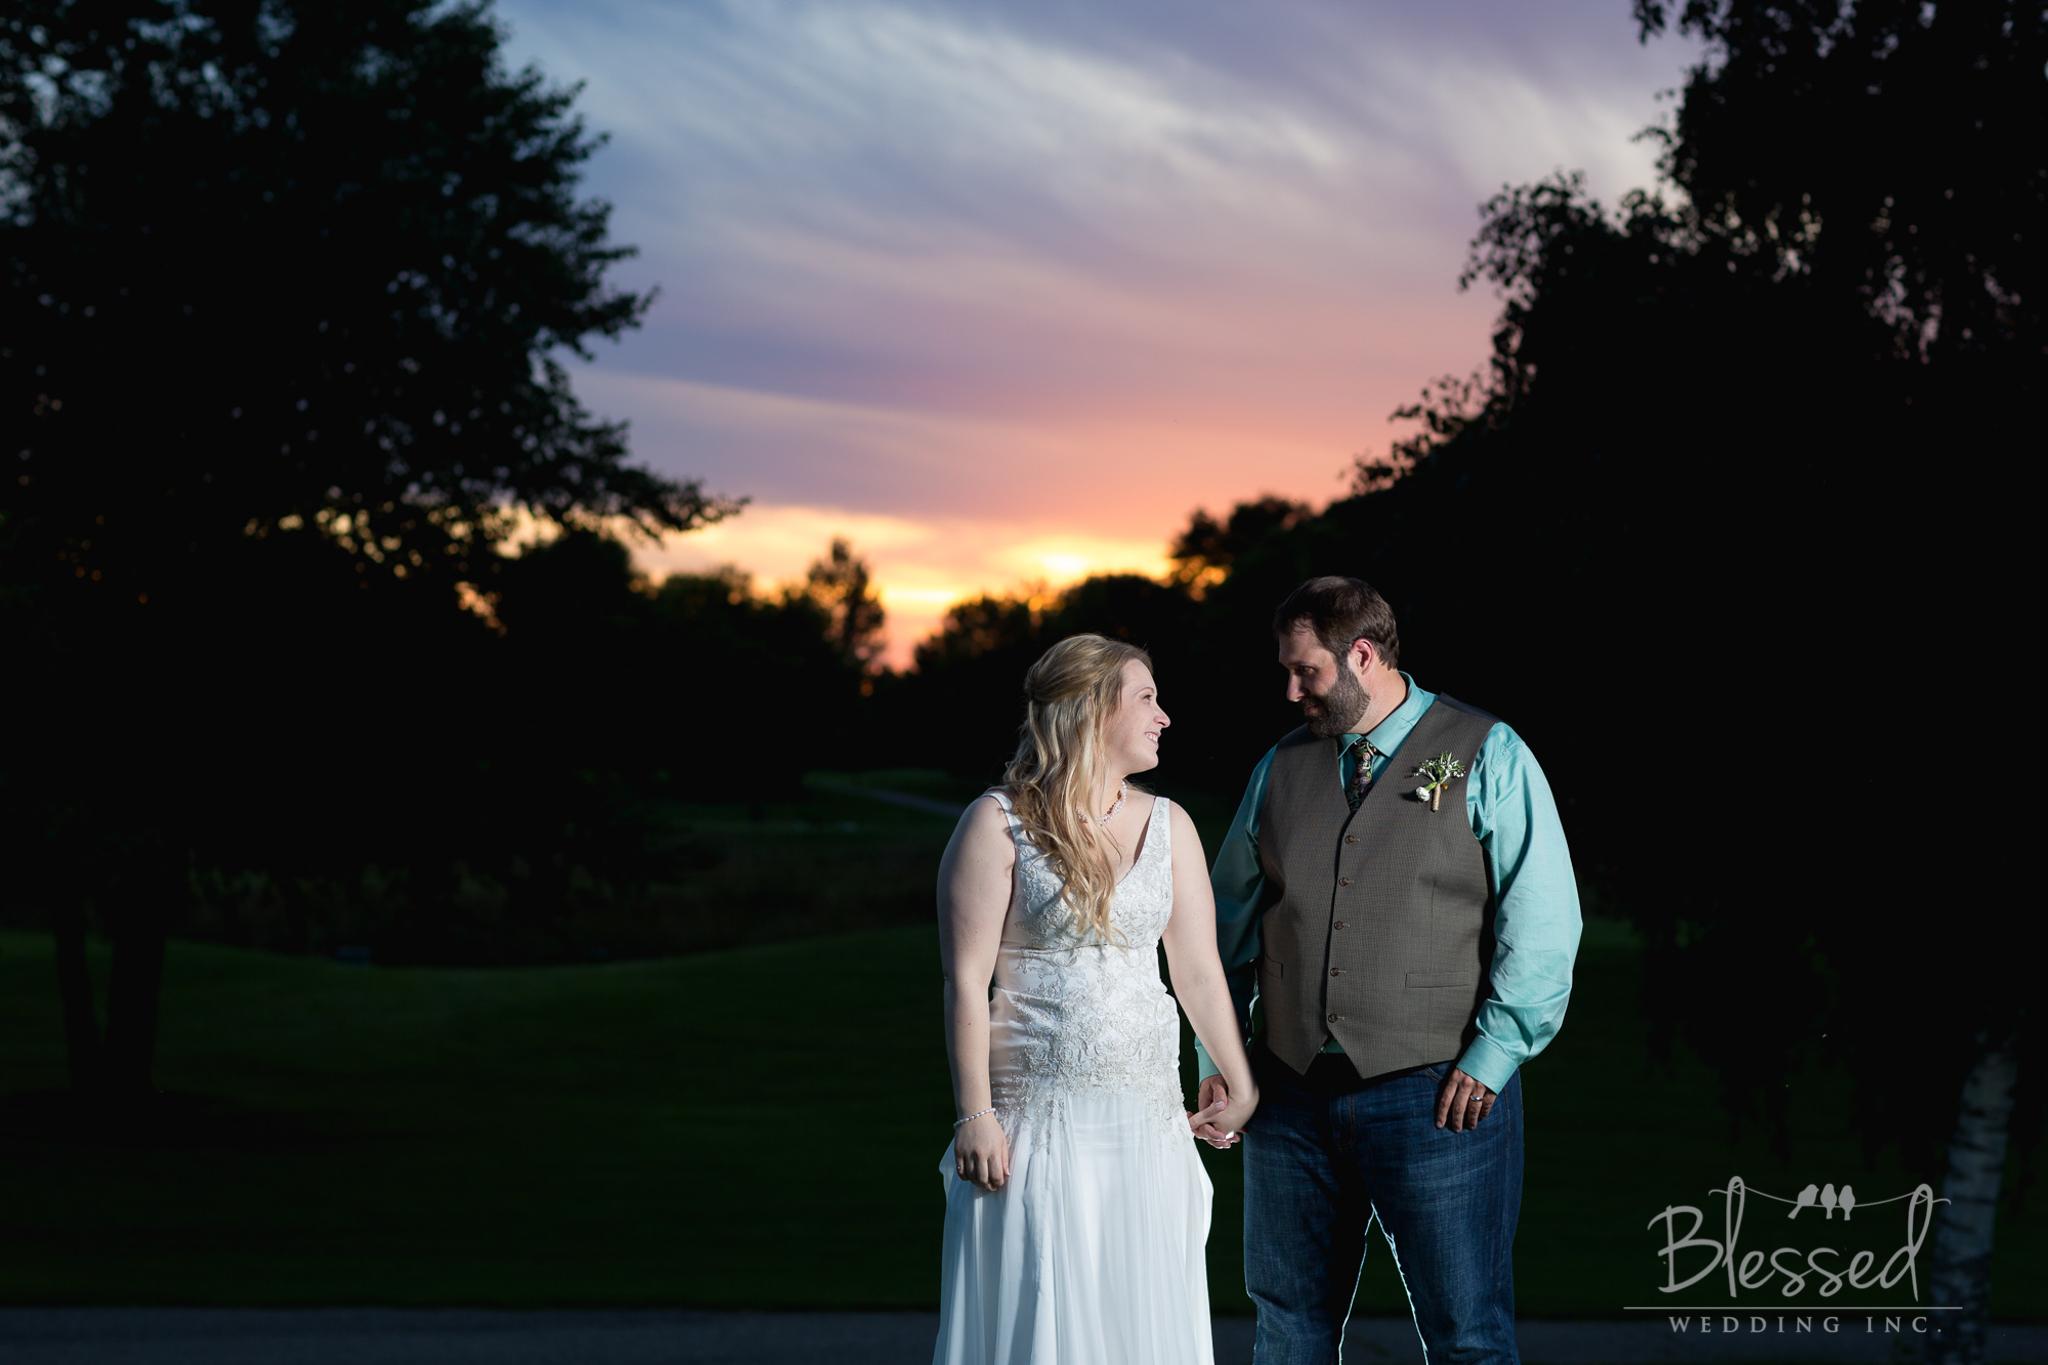 Destination Wedding Photography Minnesota By Blessed Wedding Photographers-119.jpg